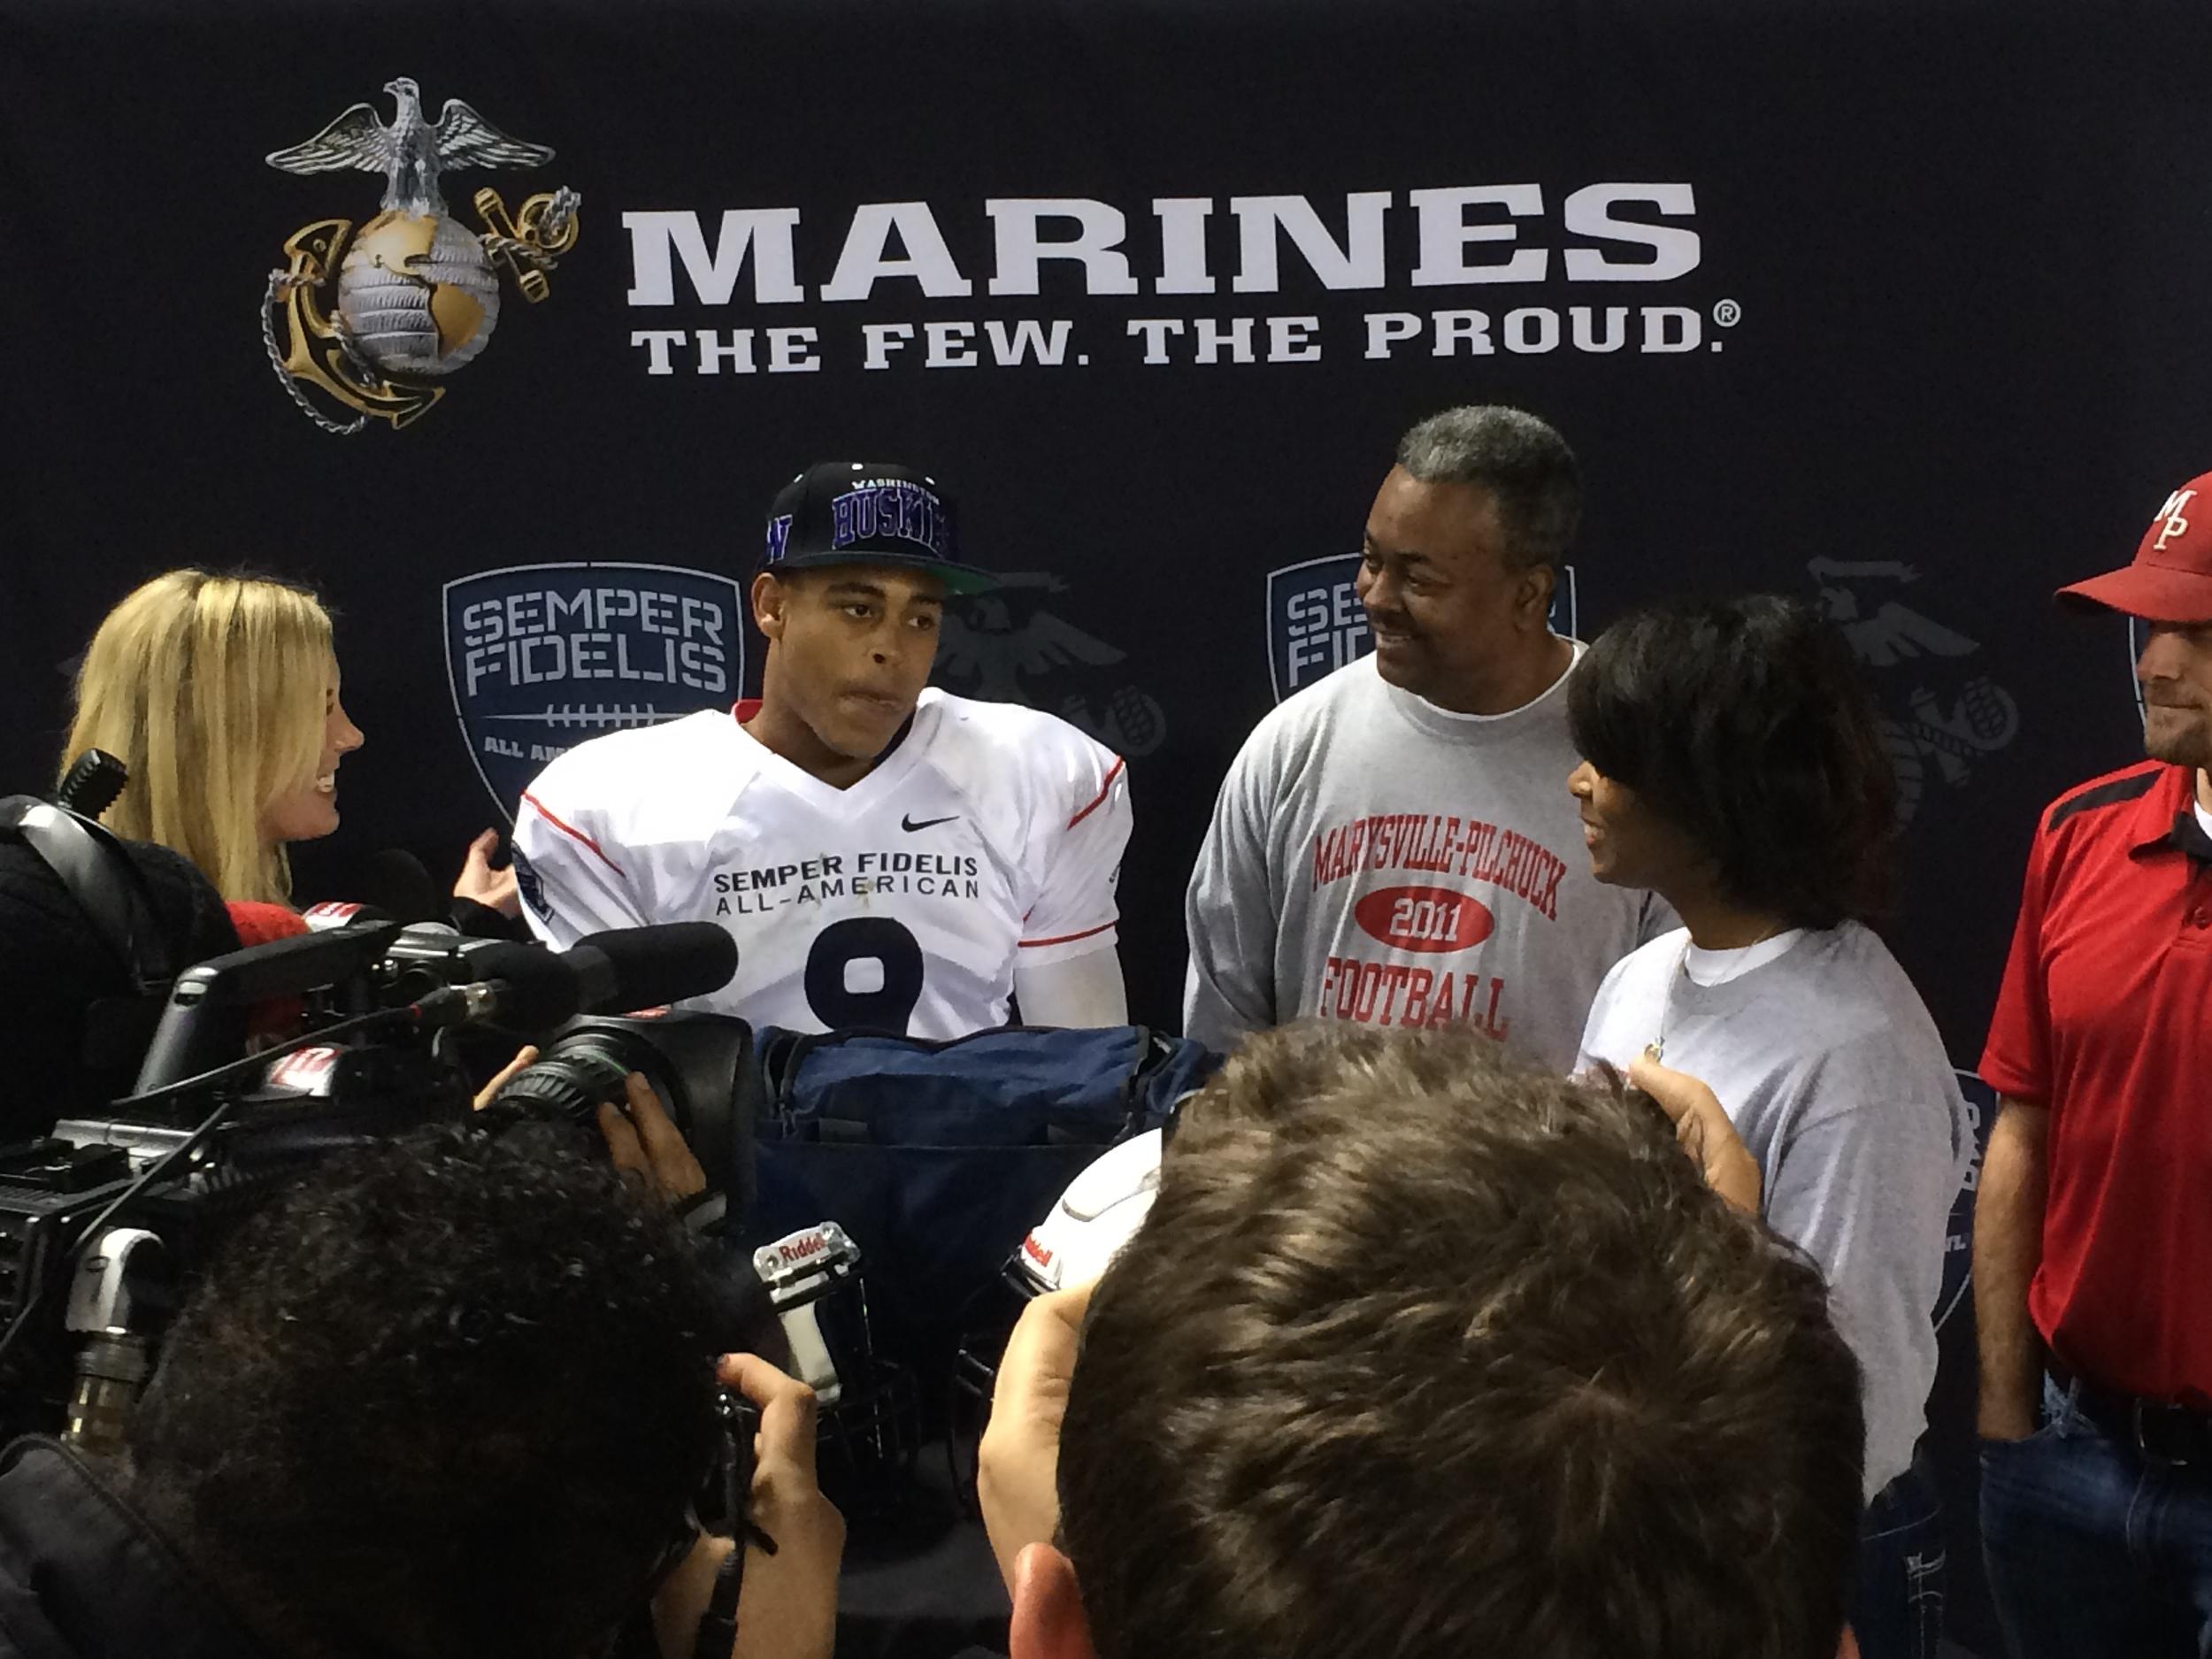 Star cornerback Austin Joyner committed to the University of Washington live on Fox Sports 1 duringthe Semper Fi Bowl.